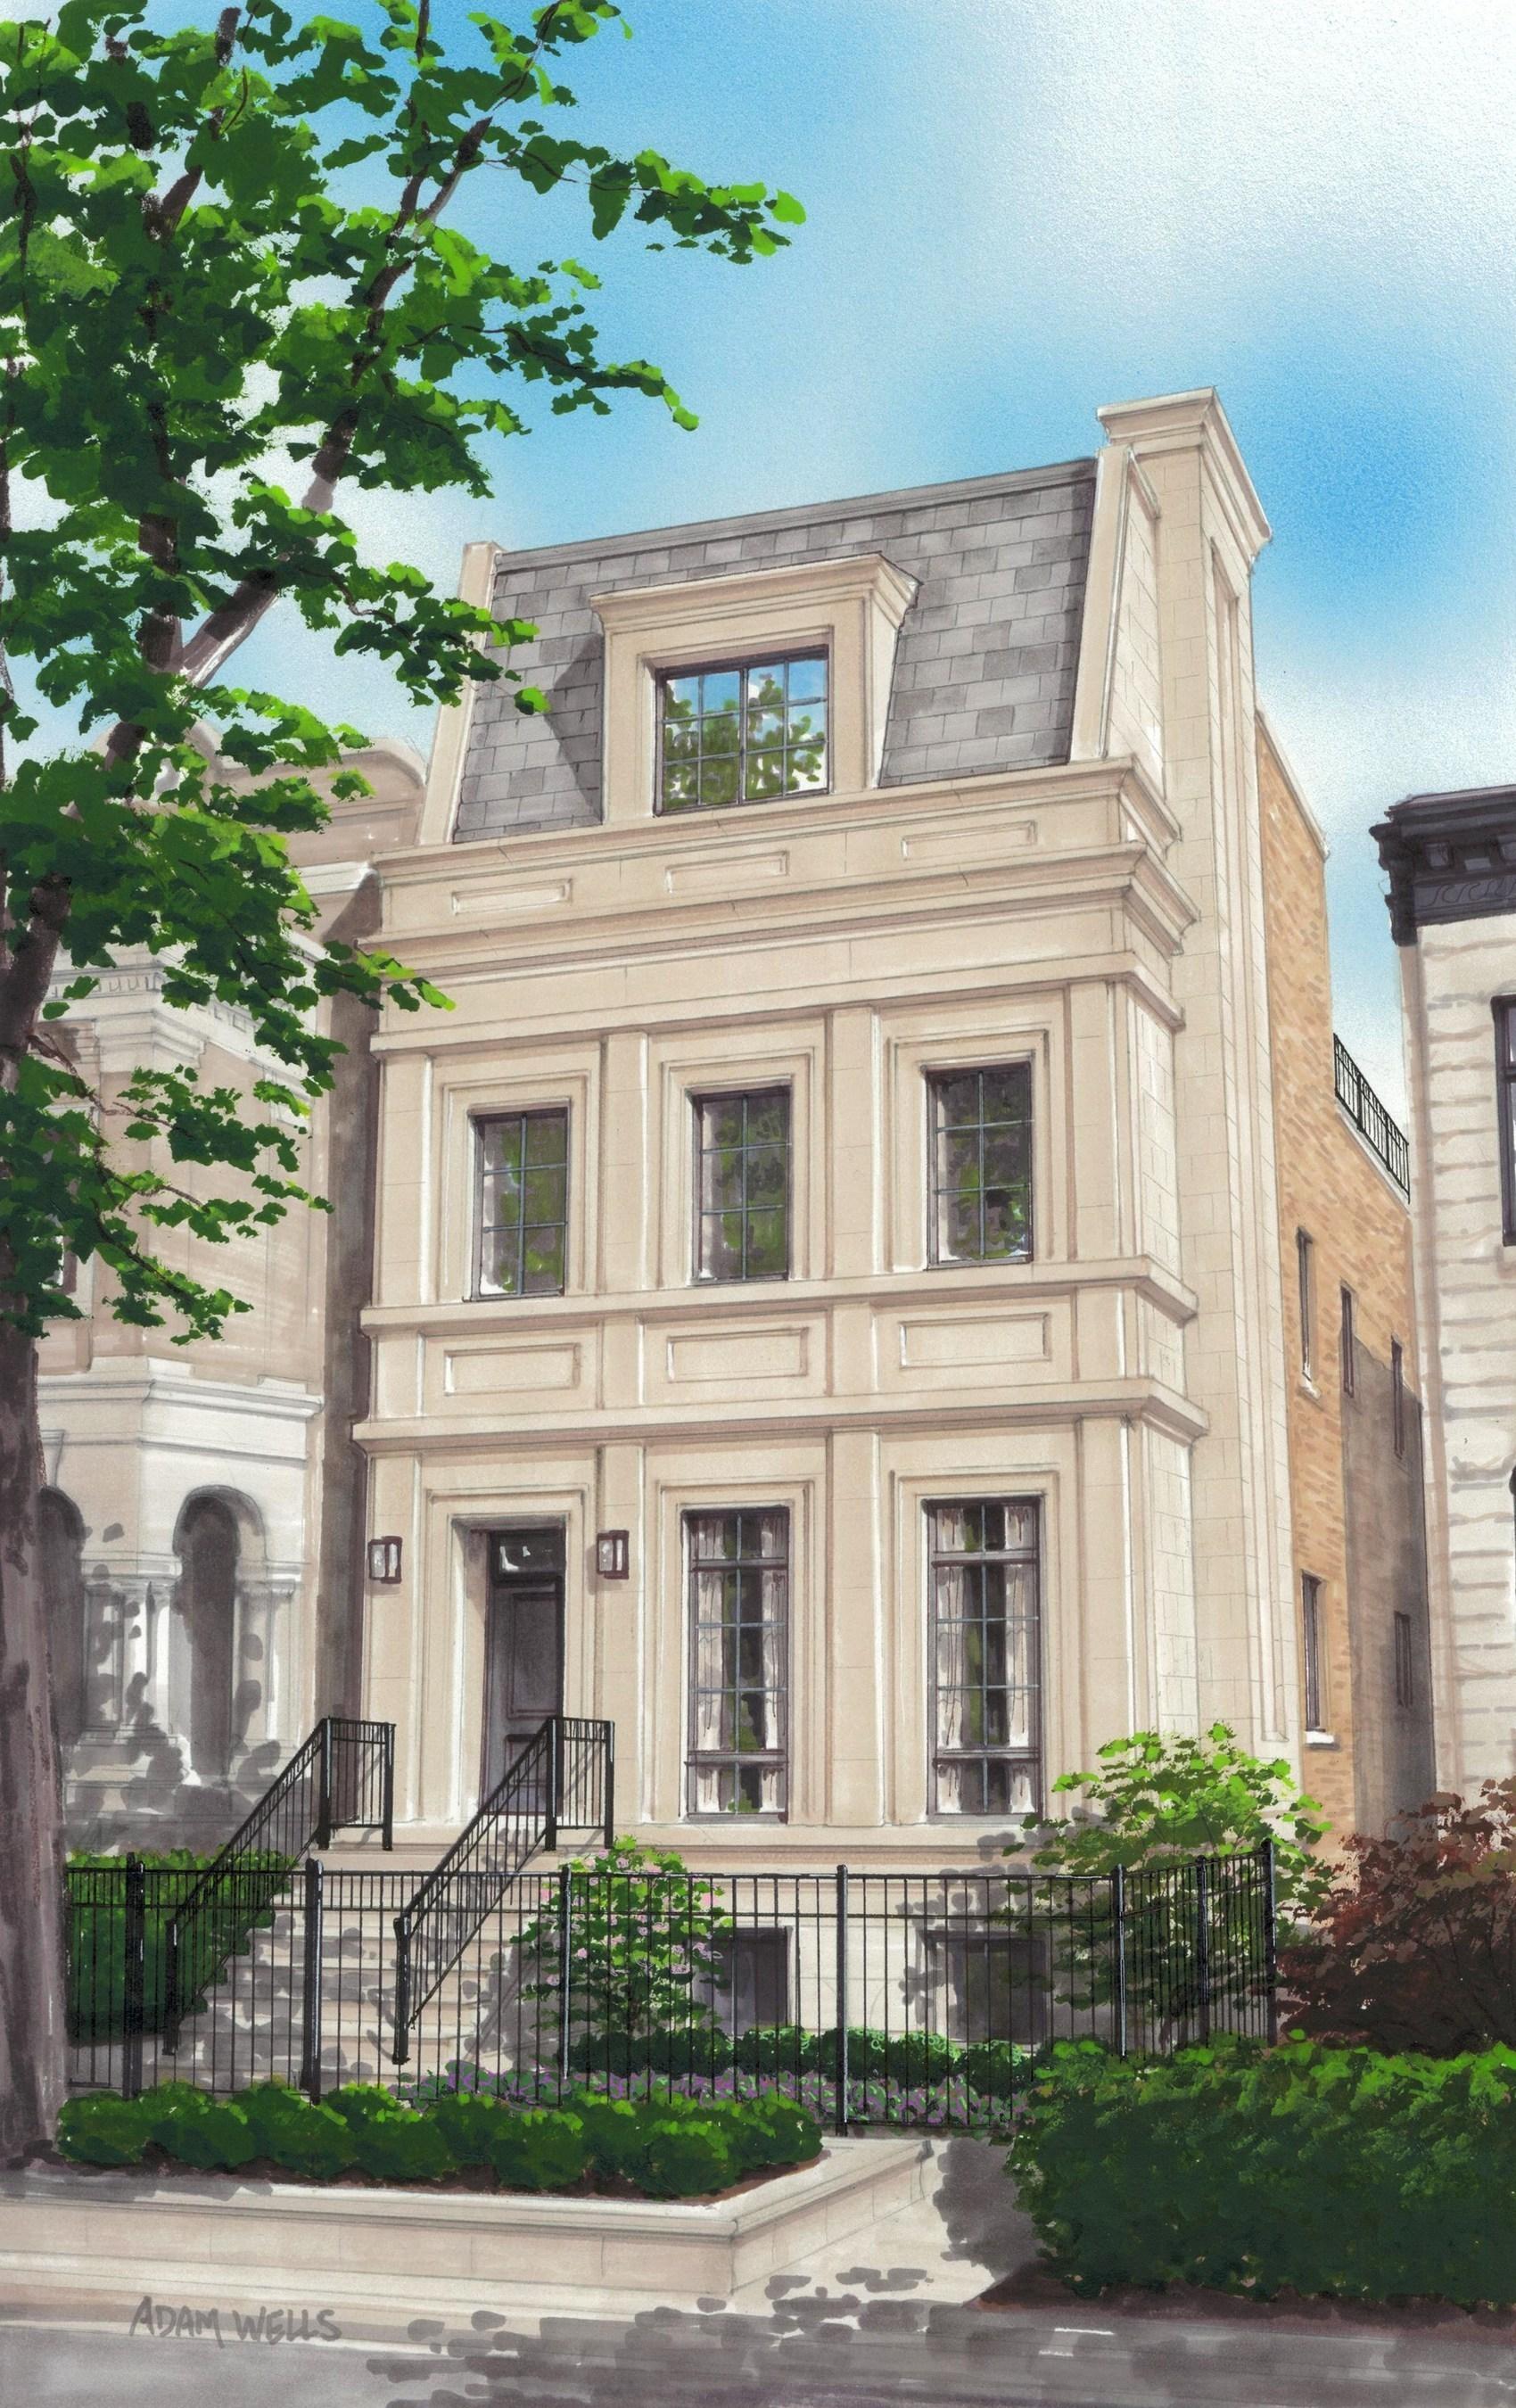 Magnificent Design Homes Dayton Ohio Image - Home Decorating Ideas ...